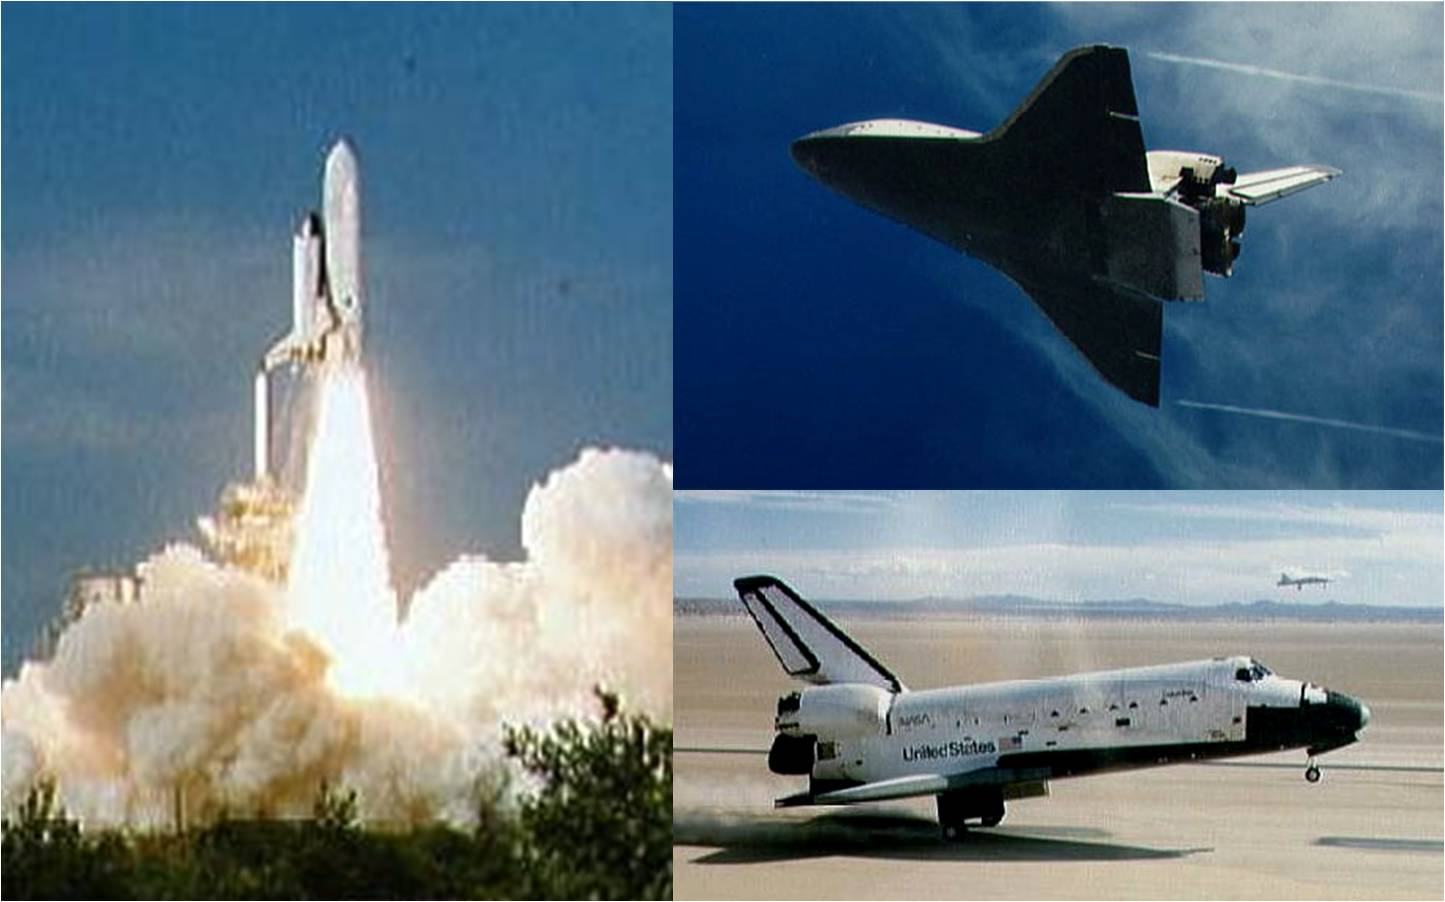 space shuttle program goals - photo #44